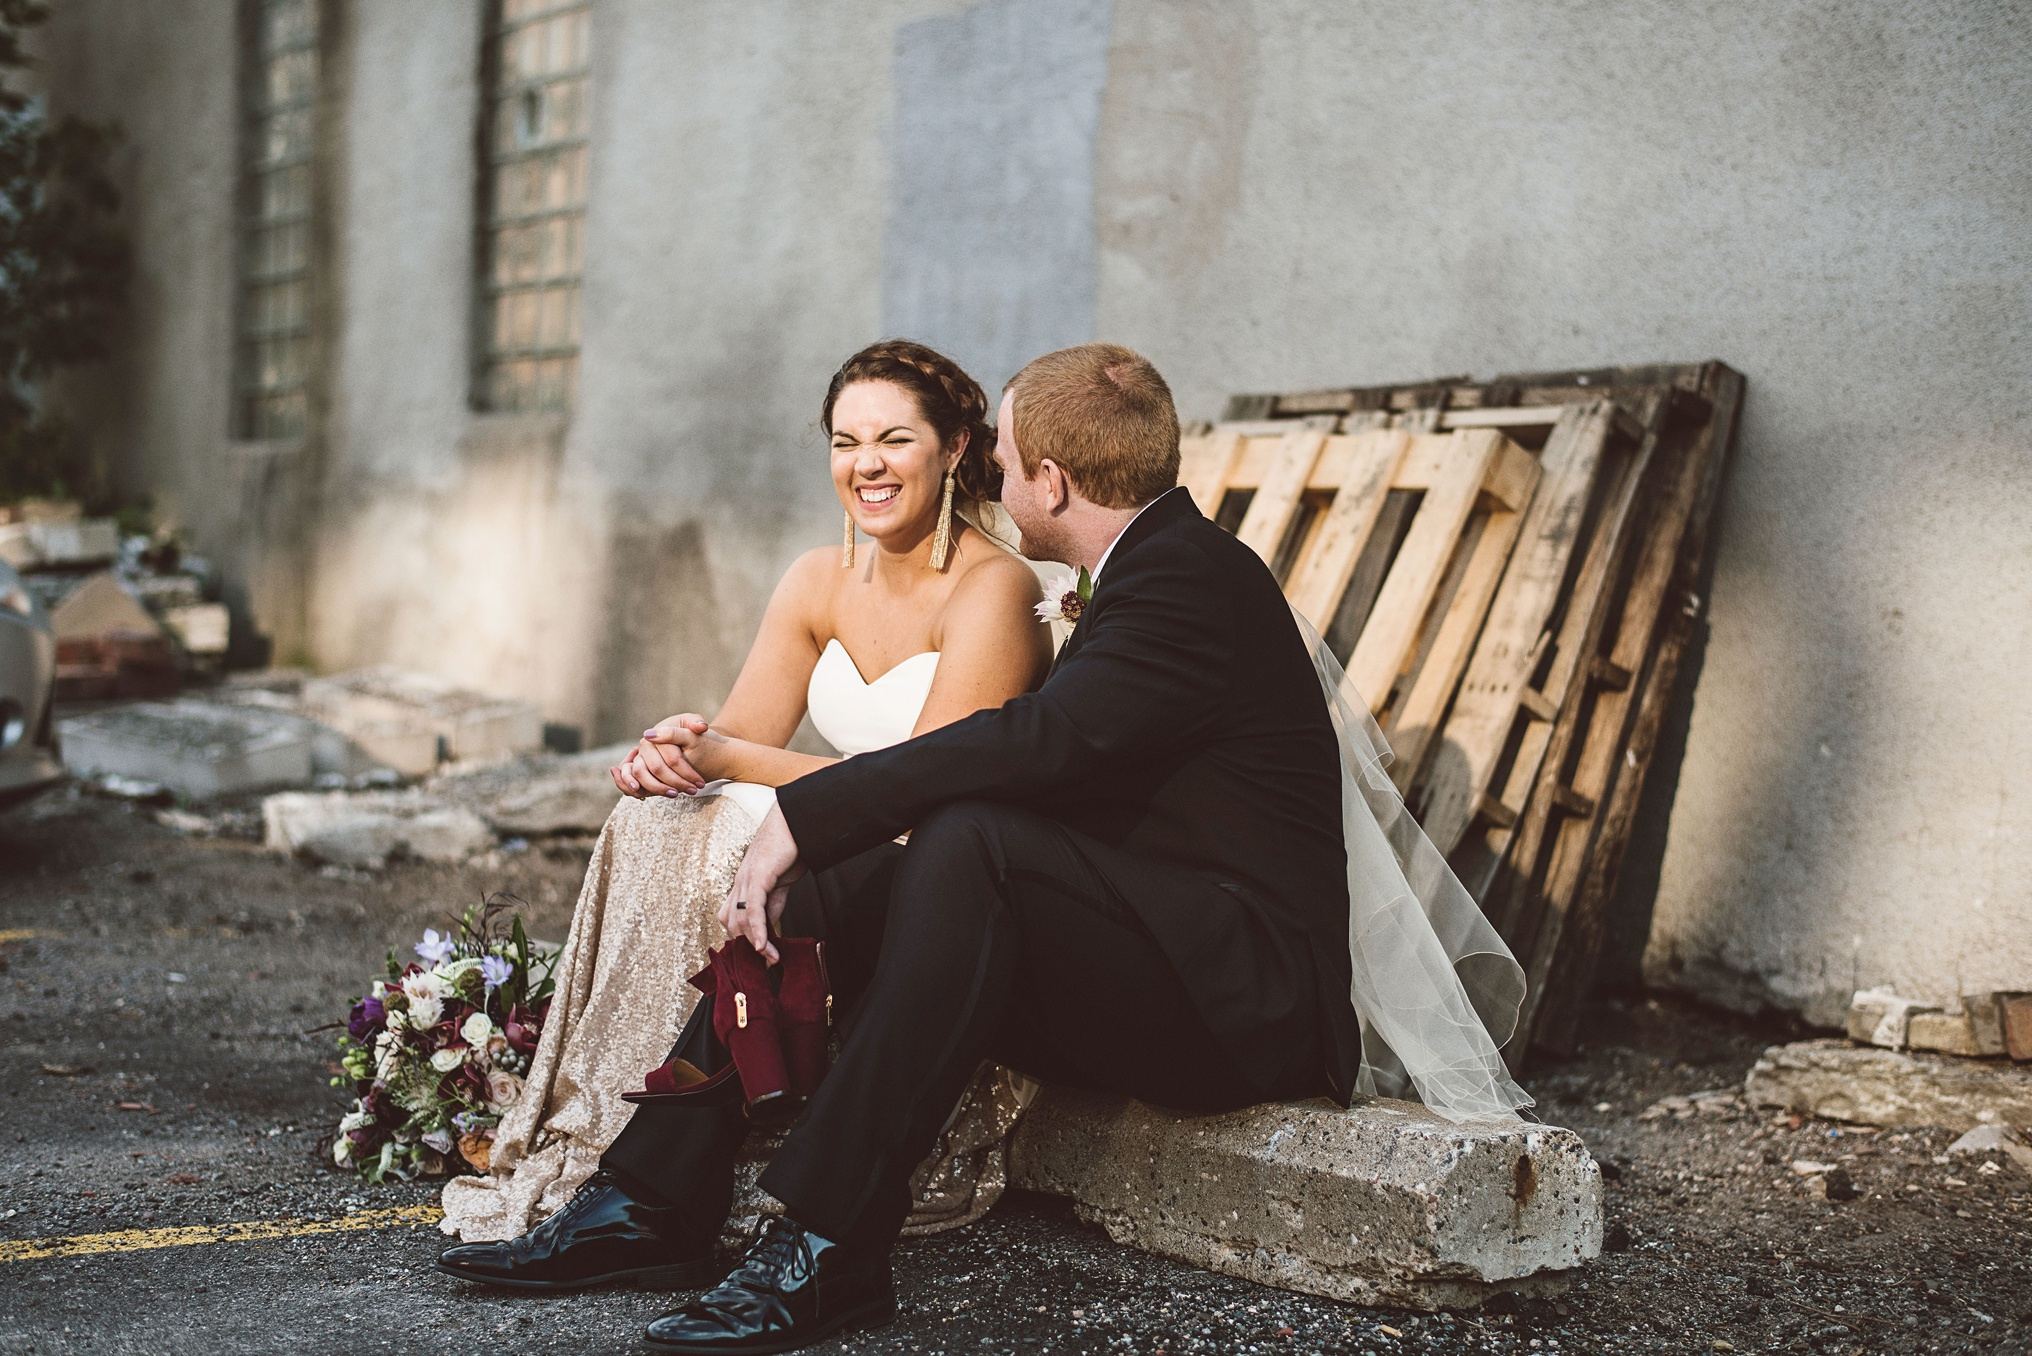 best_wedding_photography_2017_by_lucas_botz_photography_092.jpg